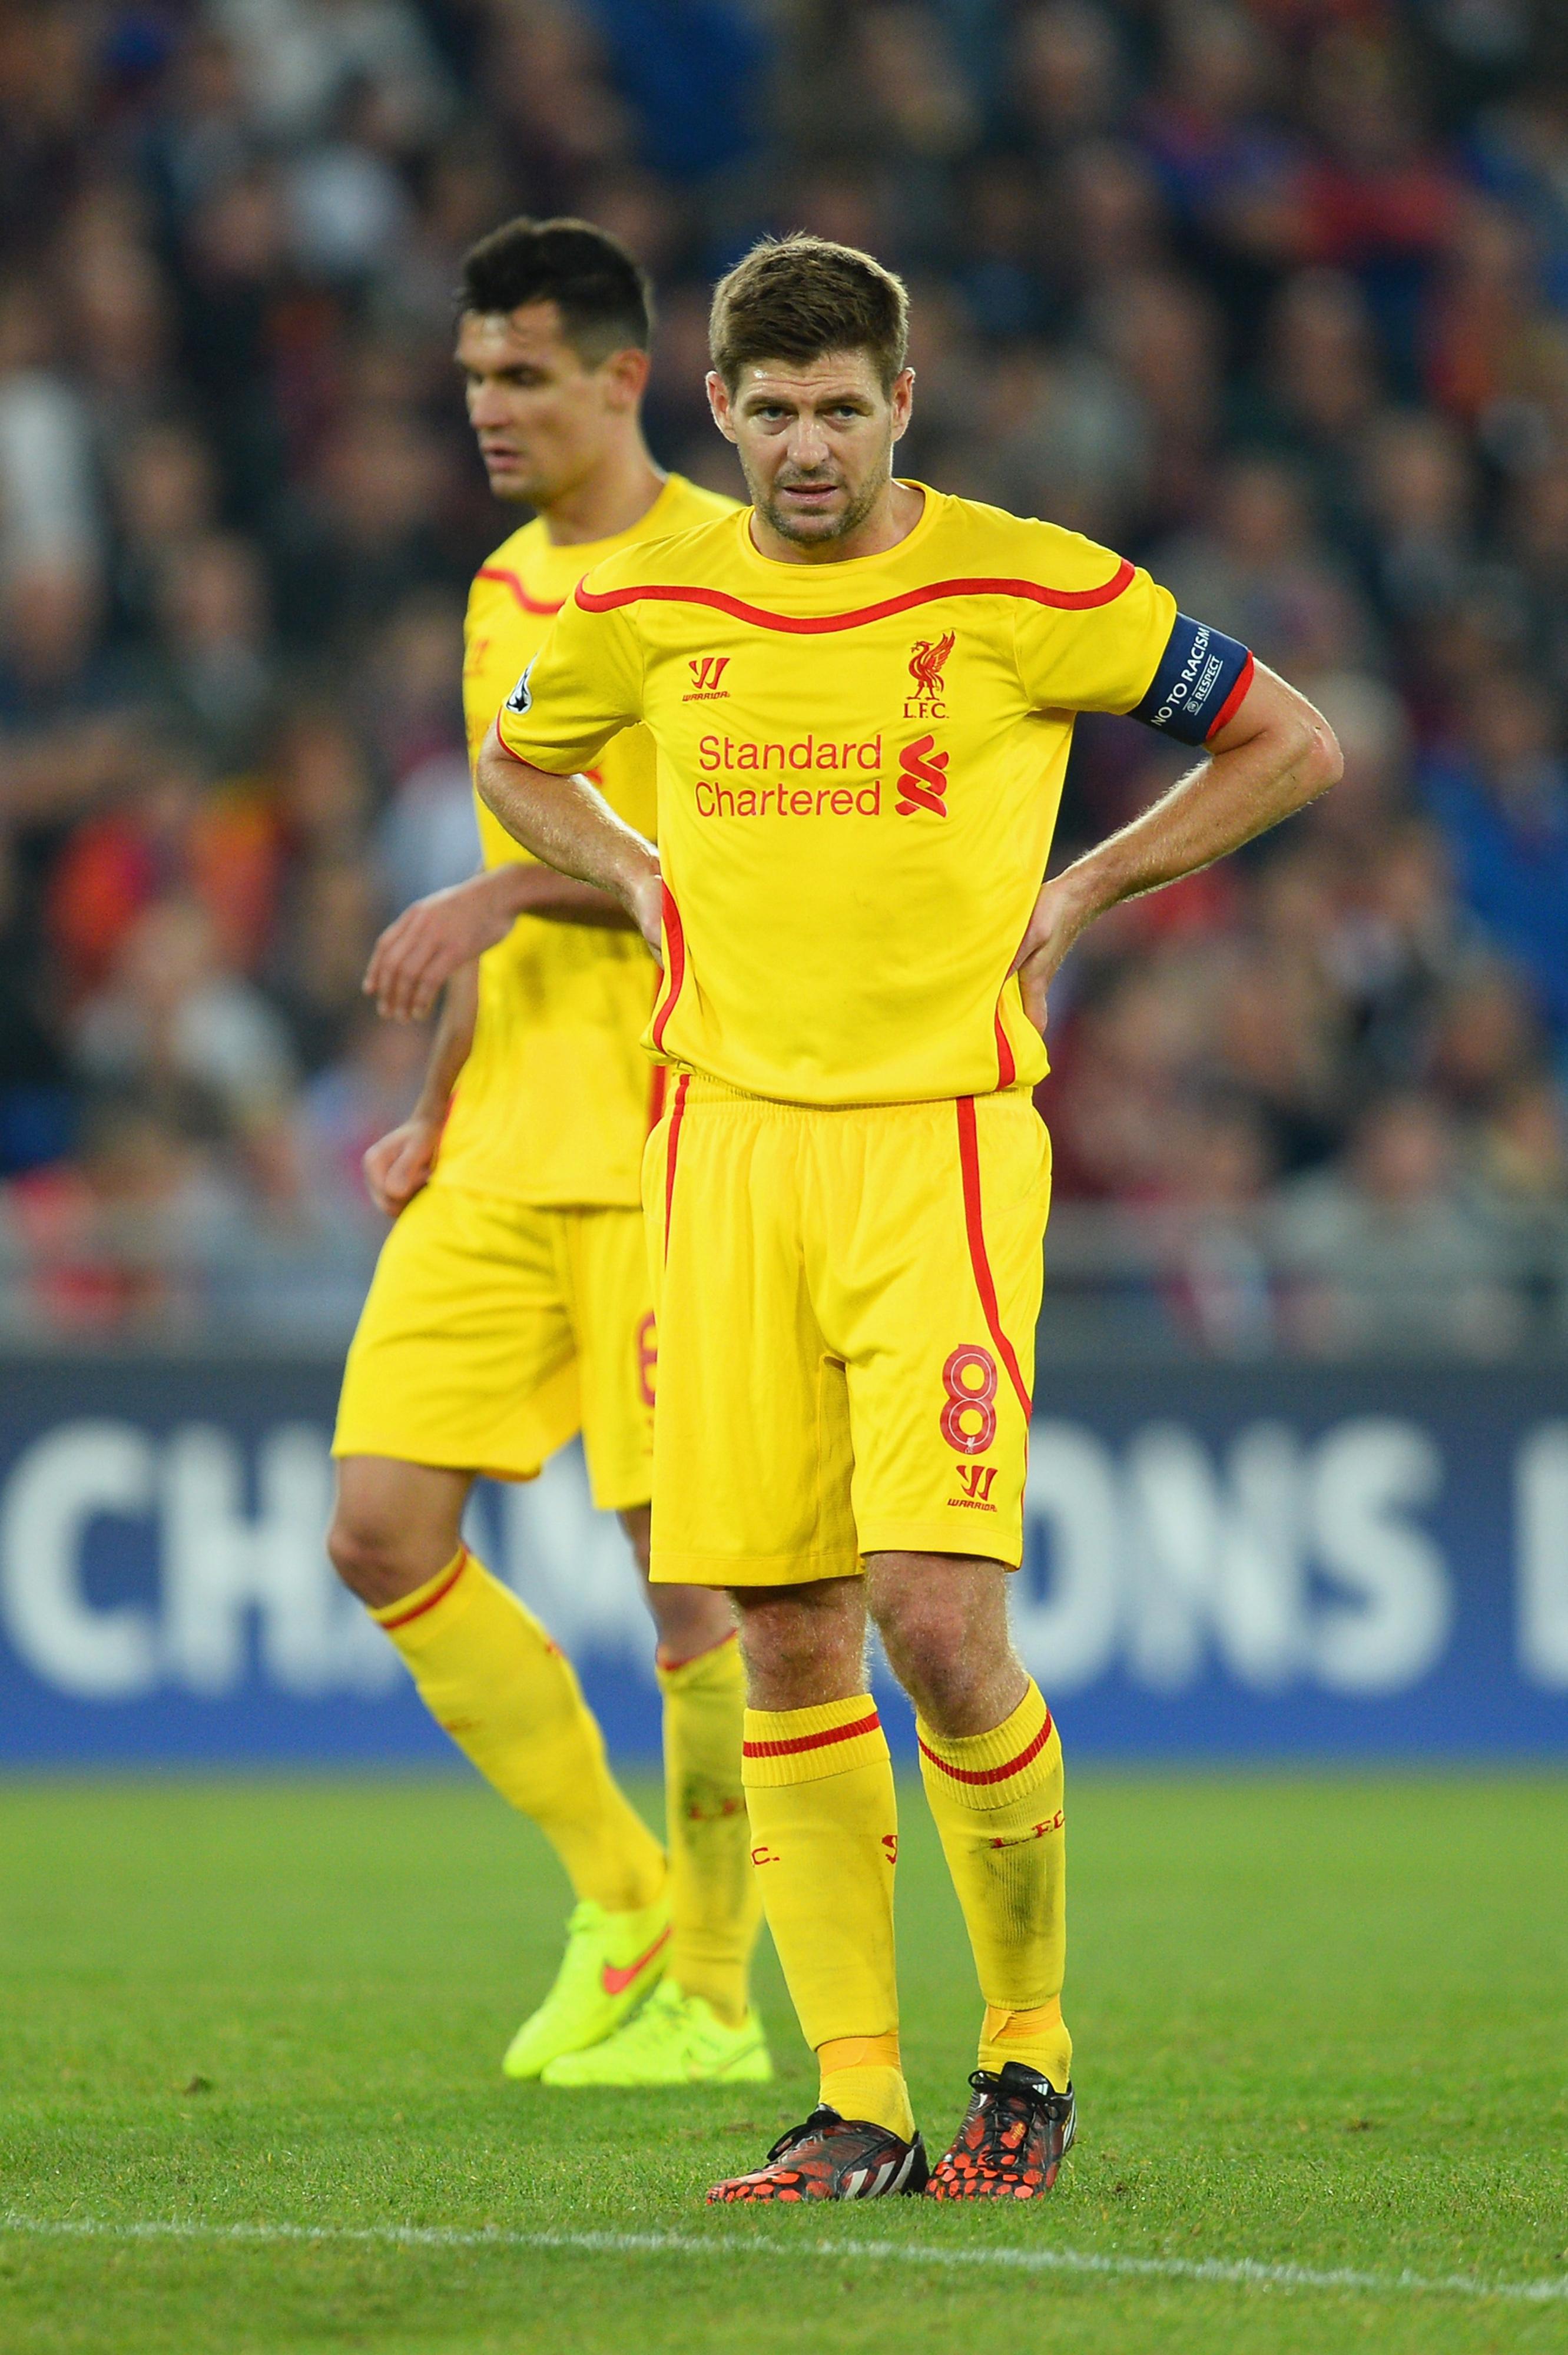 UEFA Champions League 2014, Matchday 2: Liverpool upset in Switzerland